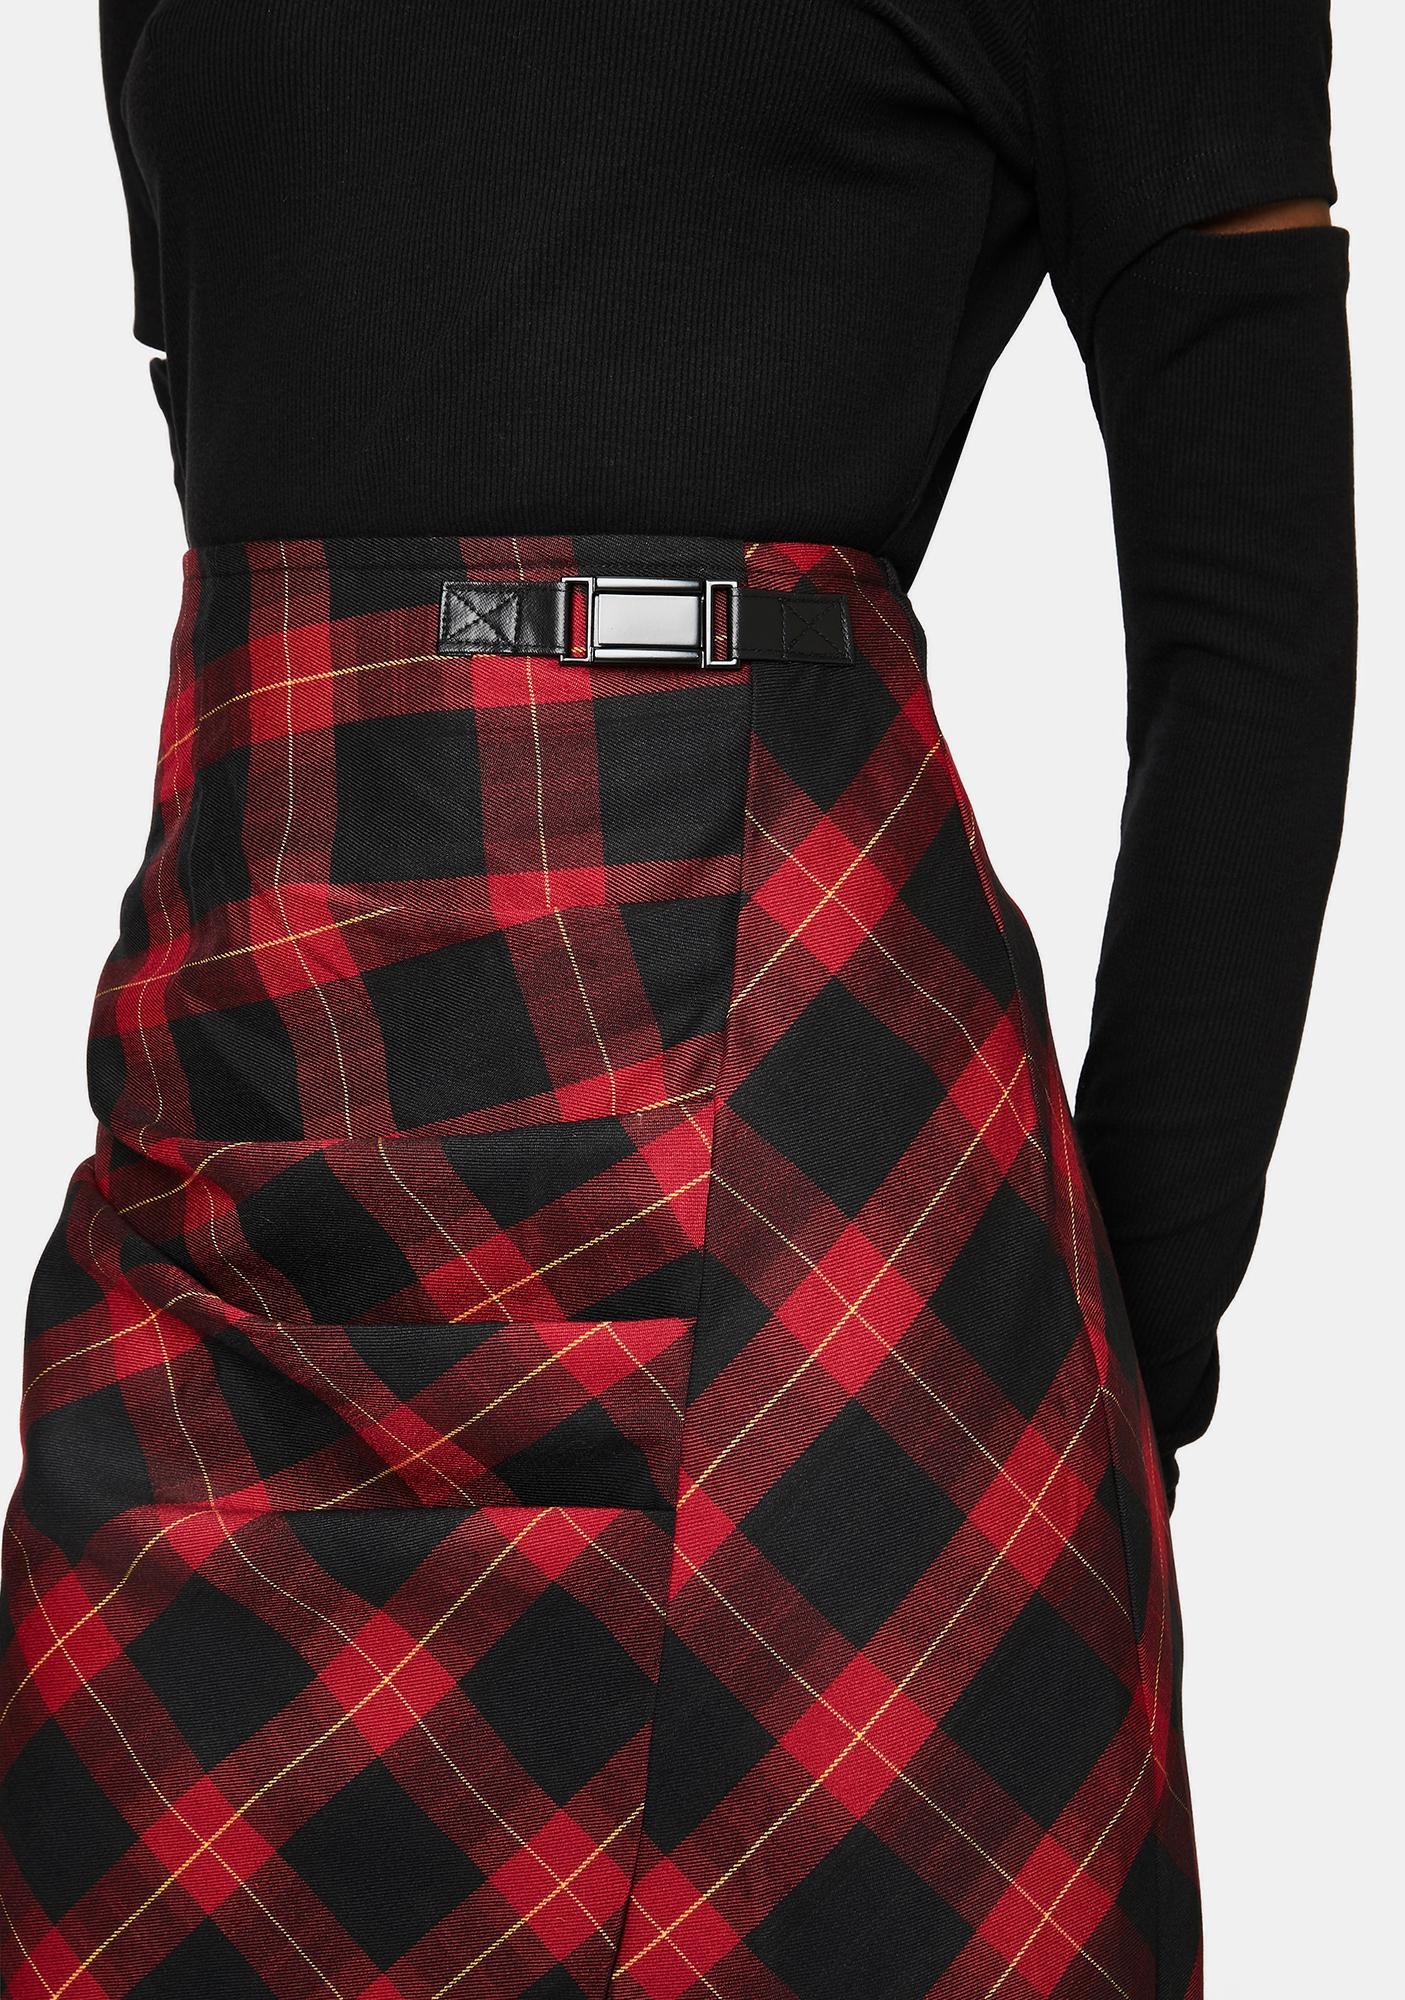 Punk Rave Ruched Plaid Midi Skirt